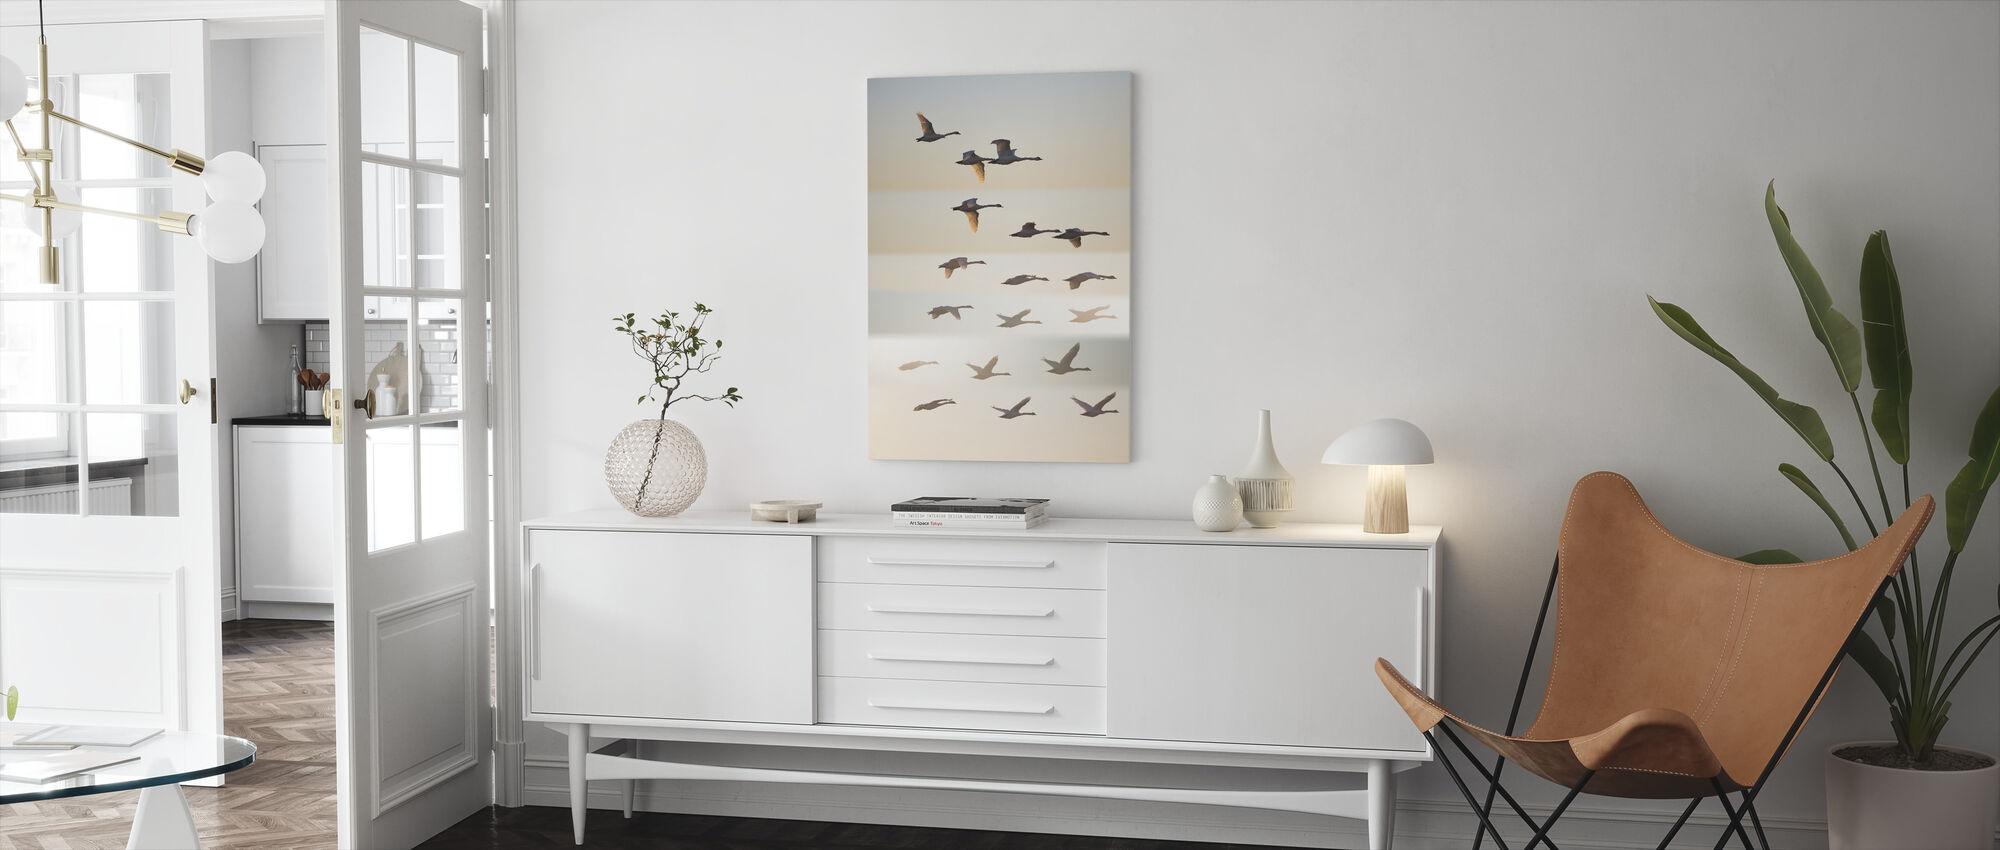 Past the Sun - Canvas print - Living Room